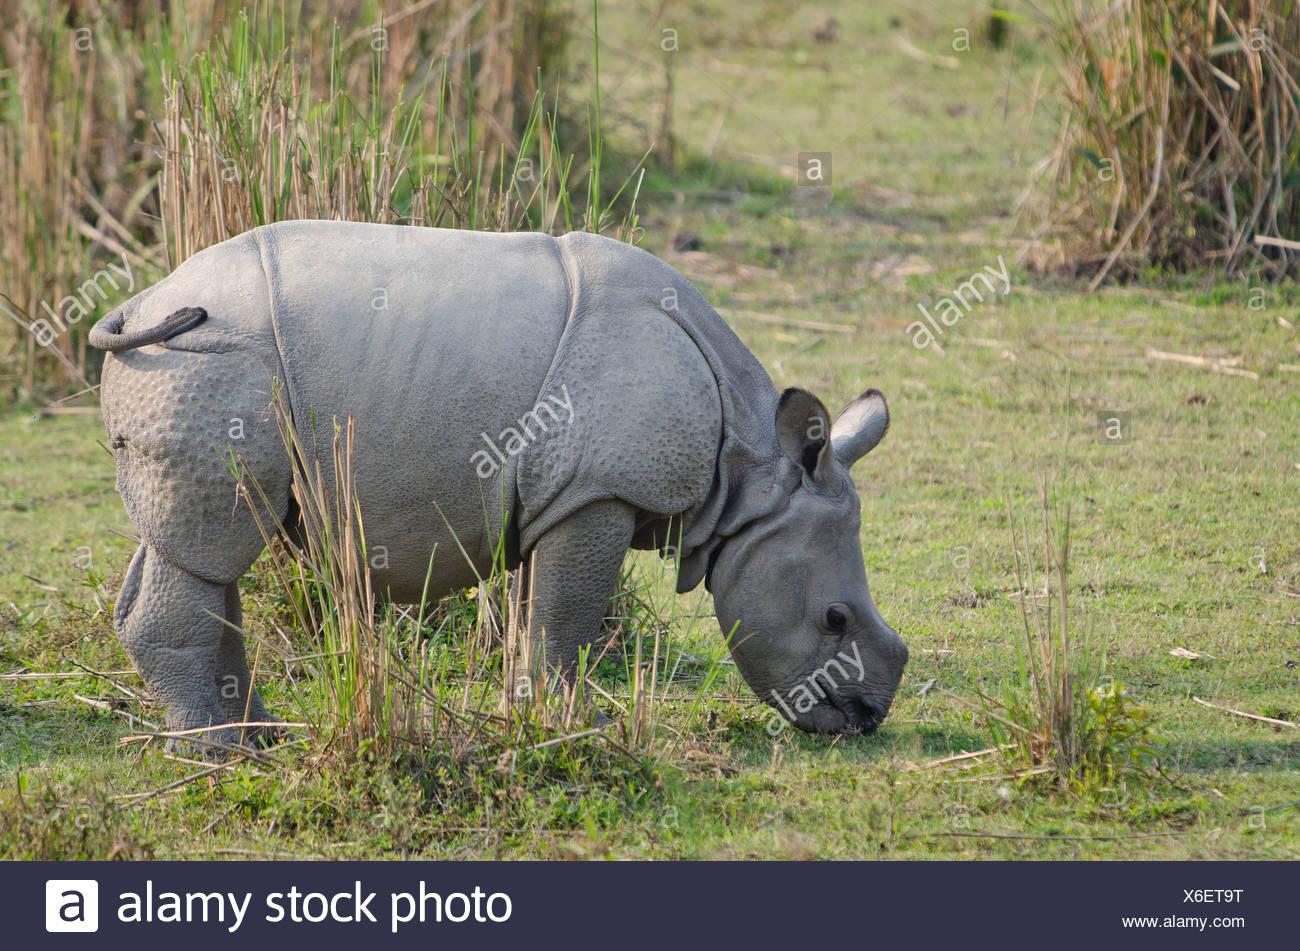 Rhinoceros (Rhinocerotidae), young, Kaziranga National Park, Assam, northeast India, India, Asia - Stock Image